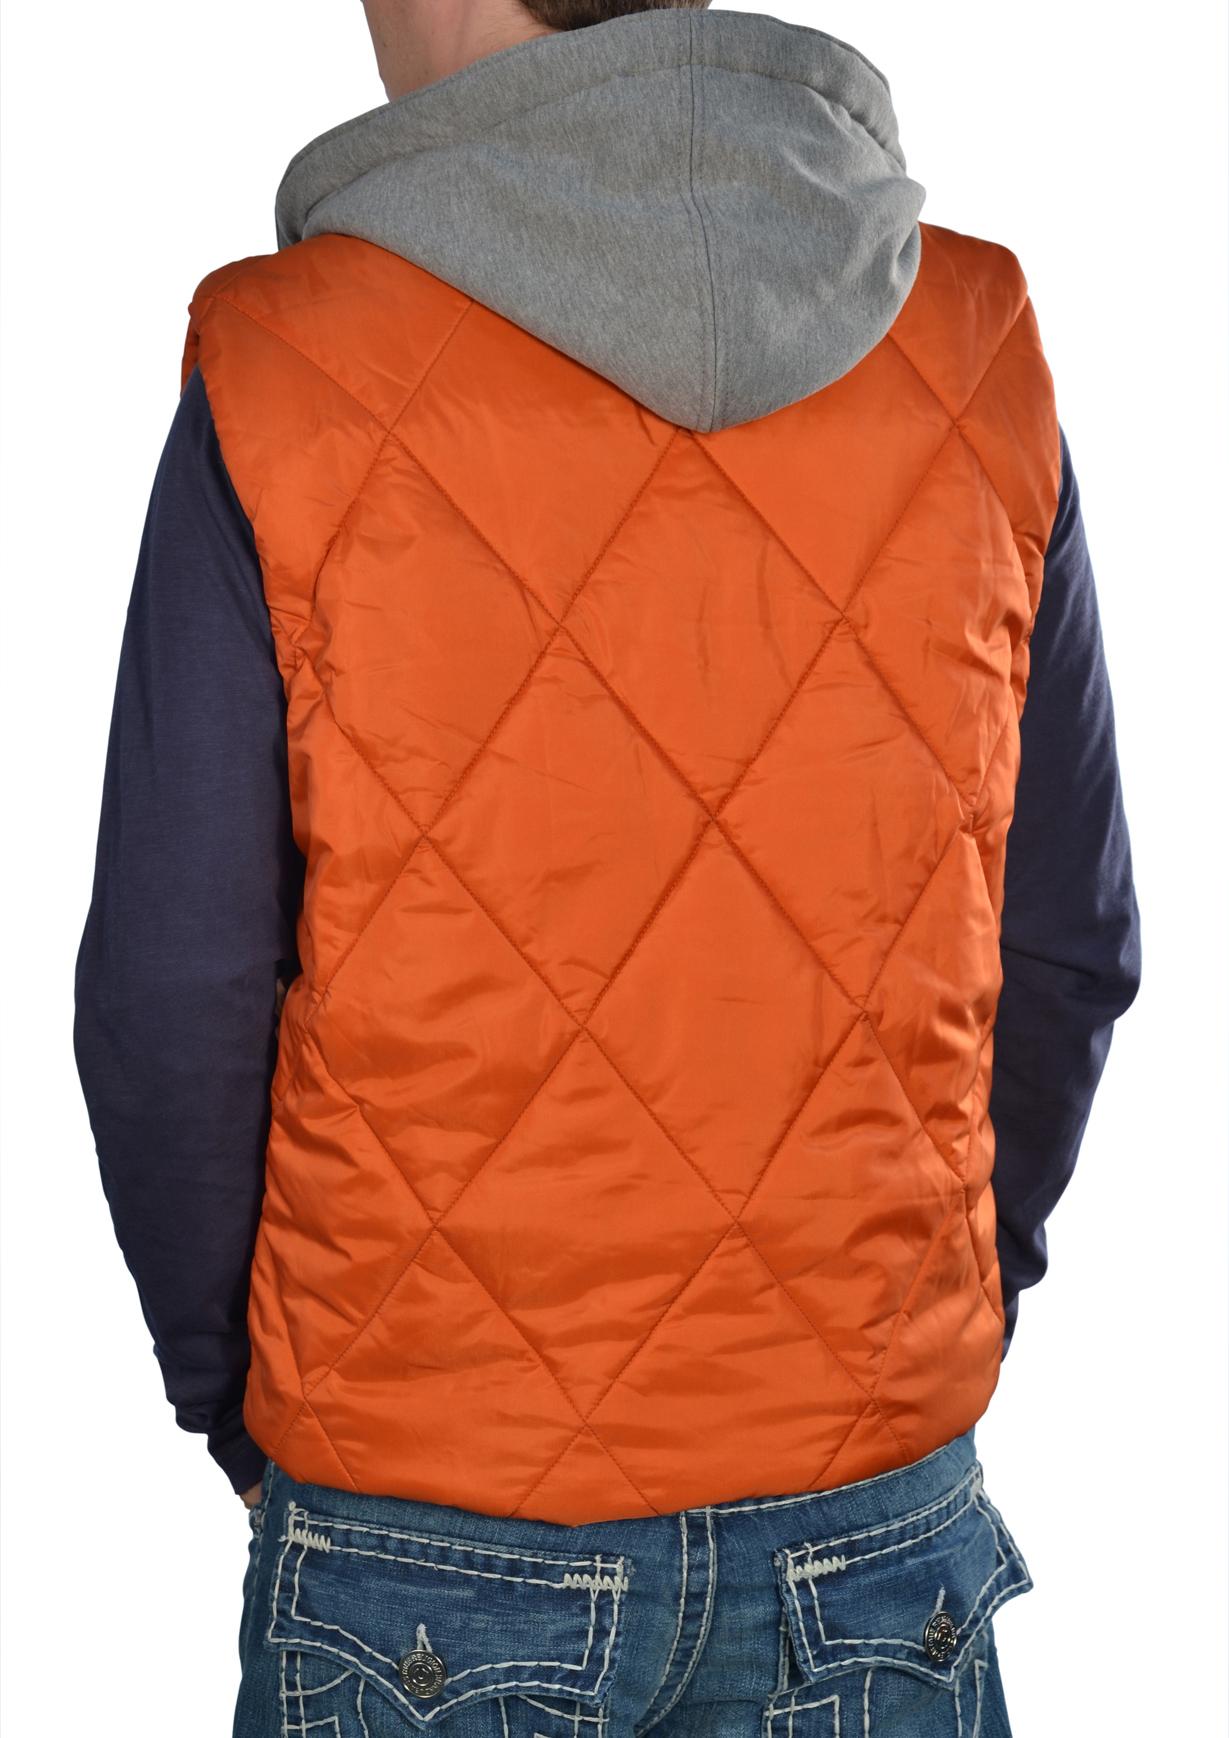 g star raw doonray removable hood quilted vest ebay. Black Bedroom Furniture Sets. Home Design Ideas